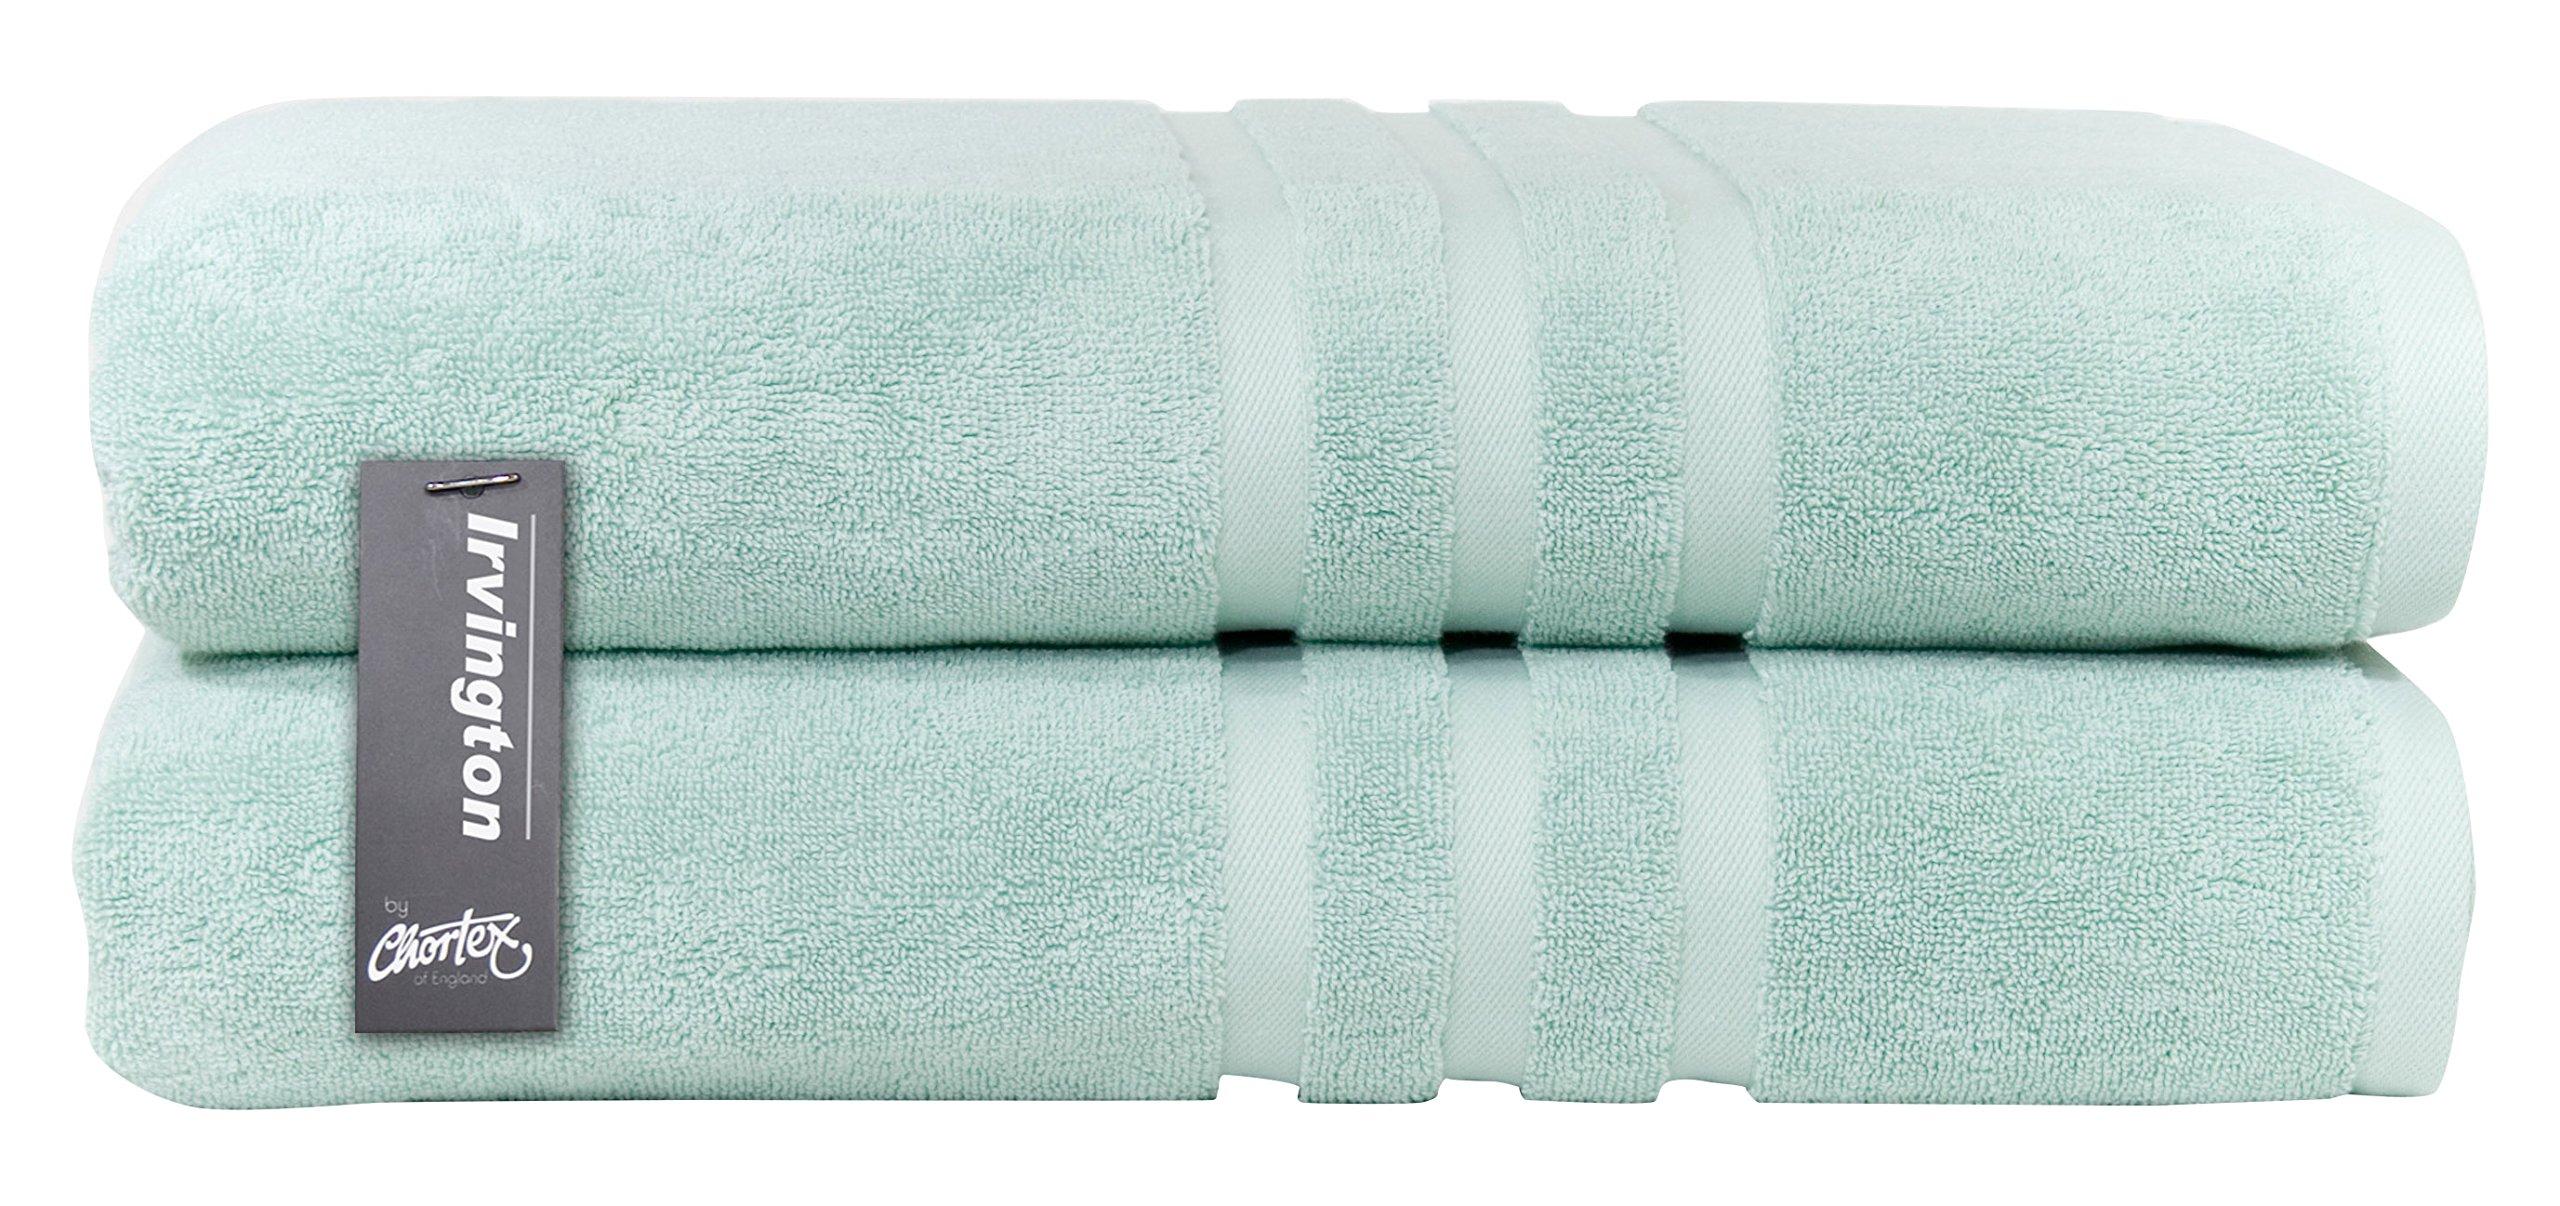 Chortex Luxury Turkish Cotton Bath Sheet (2 Pack), Pack of 2, Mineral